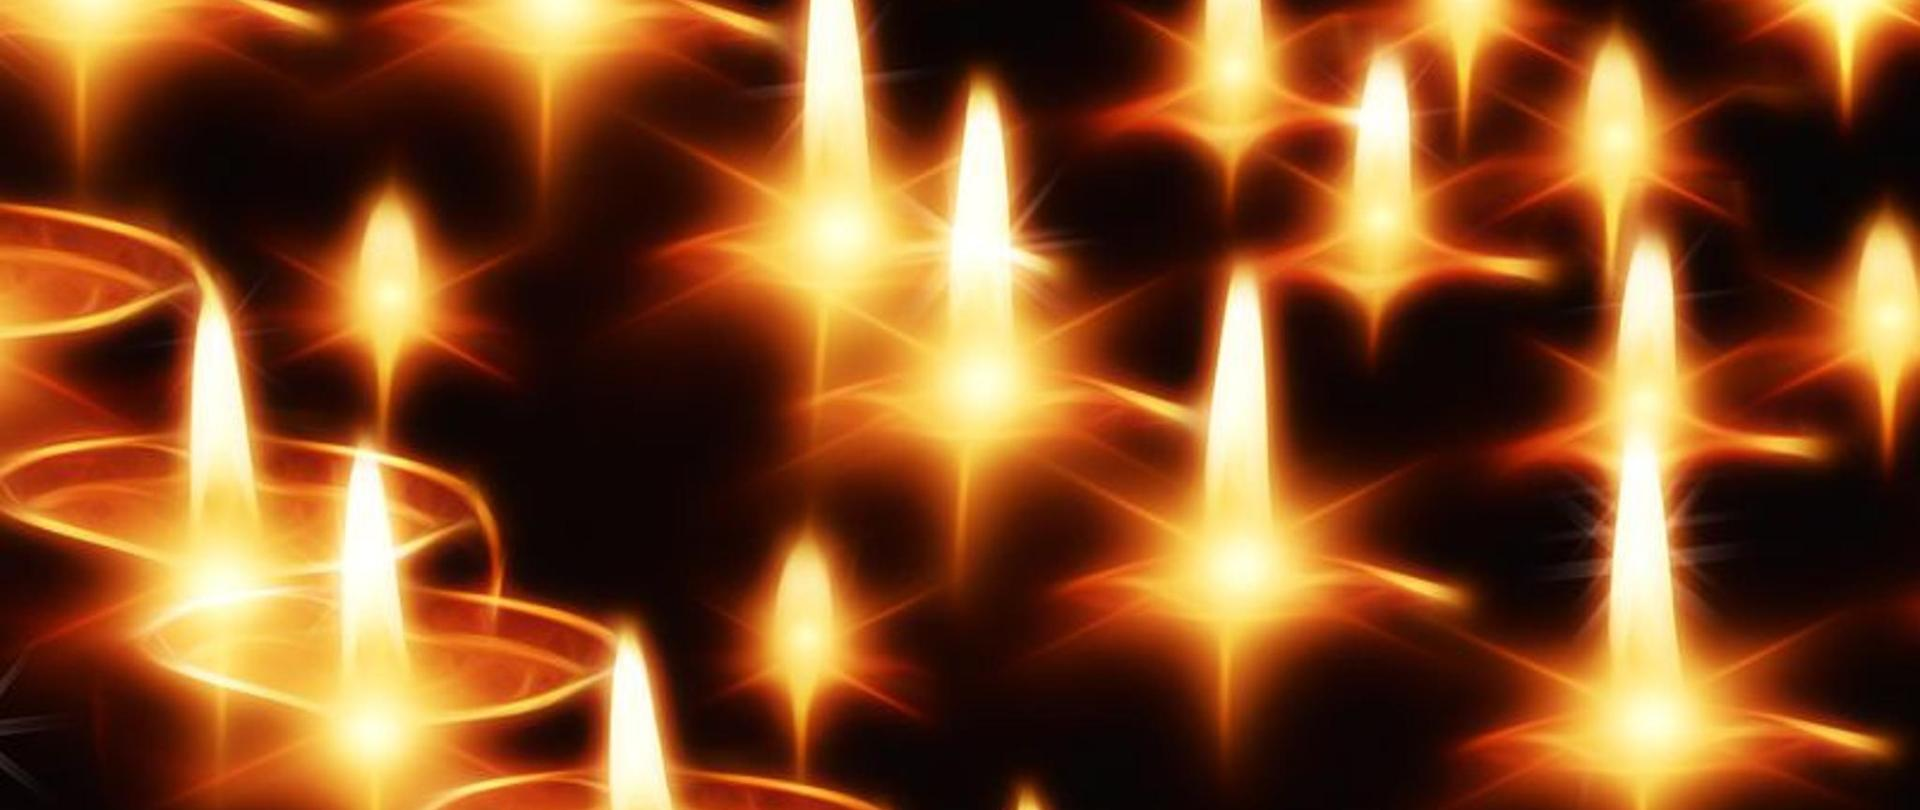 candles-141892__480.jpg